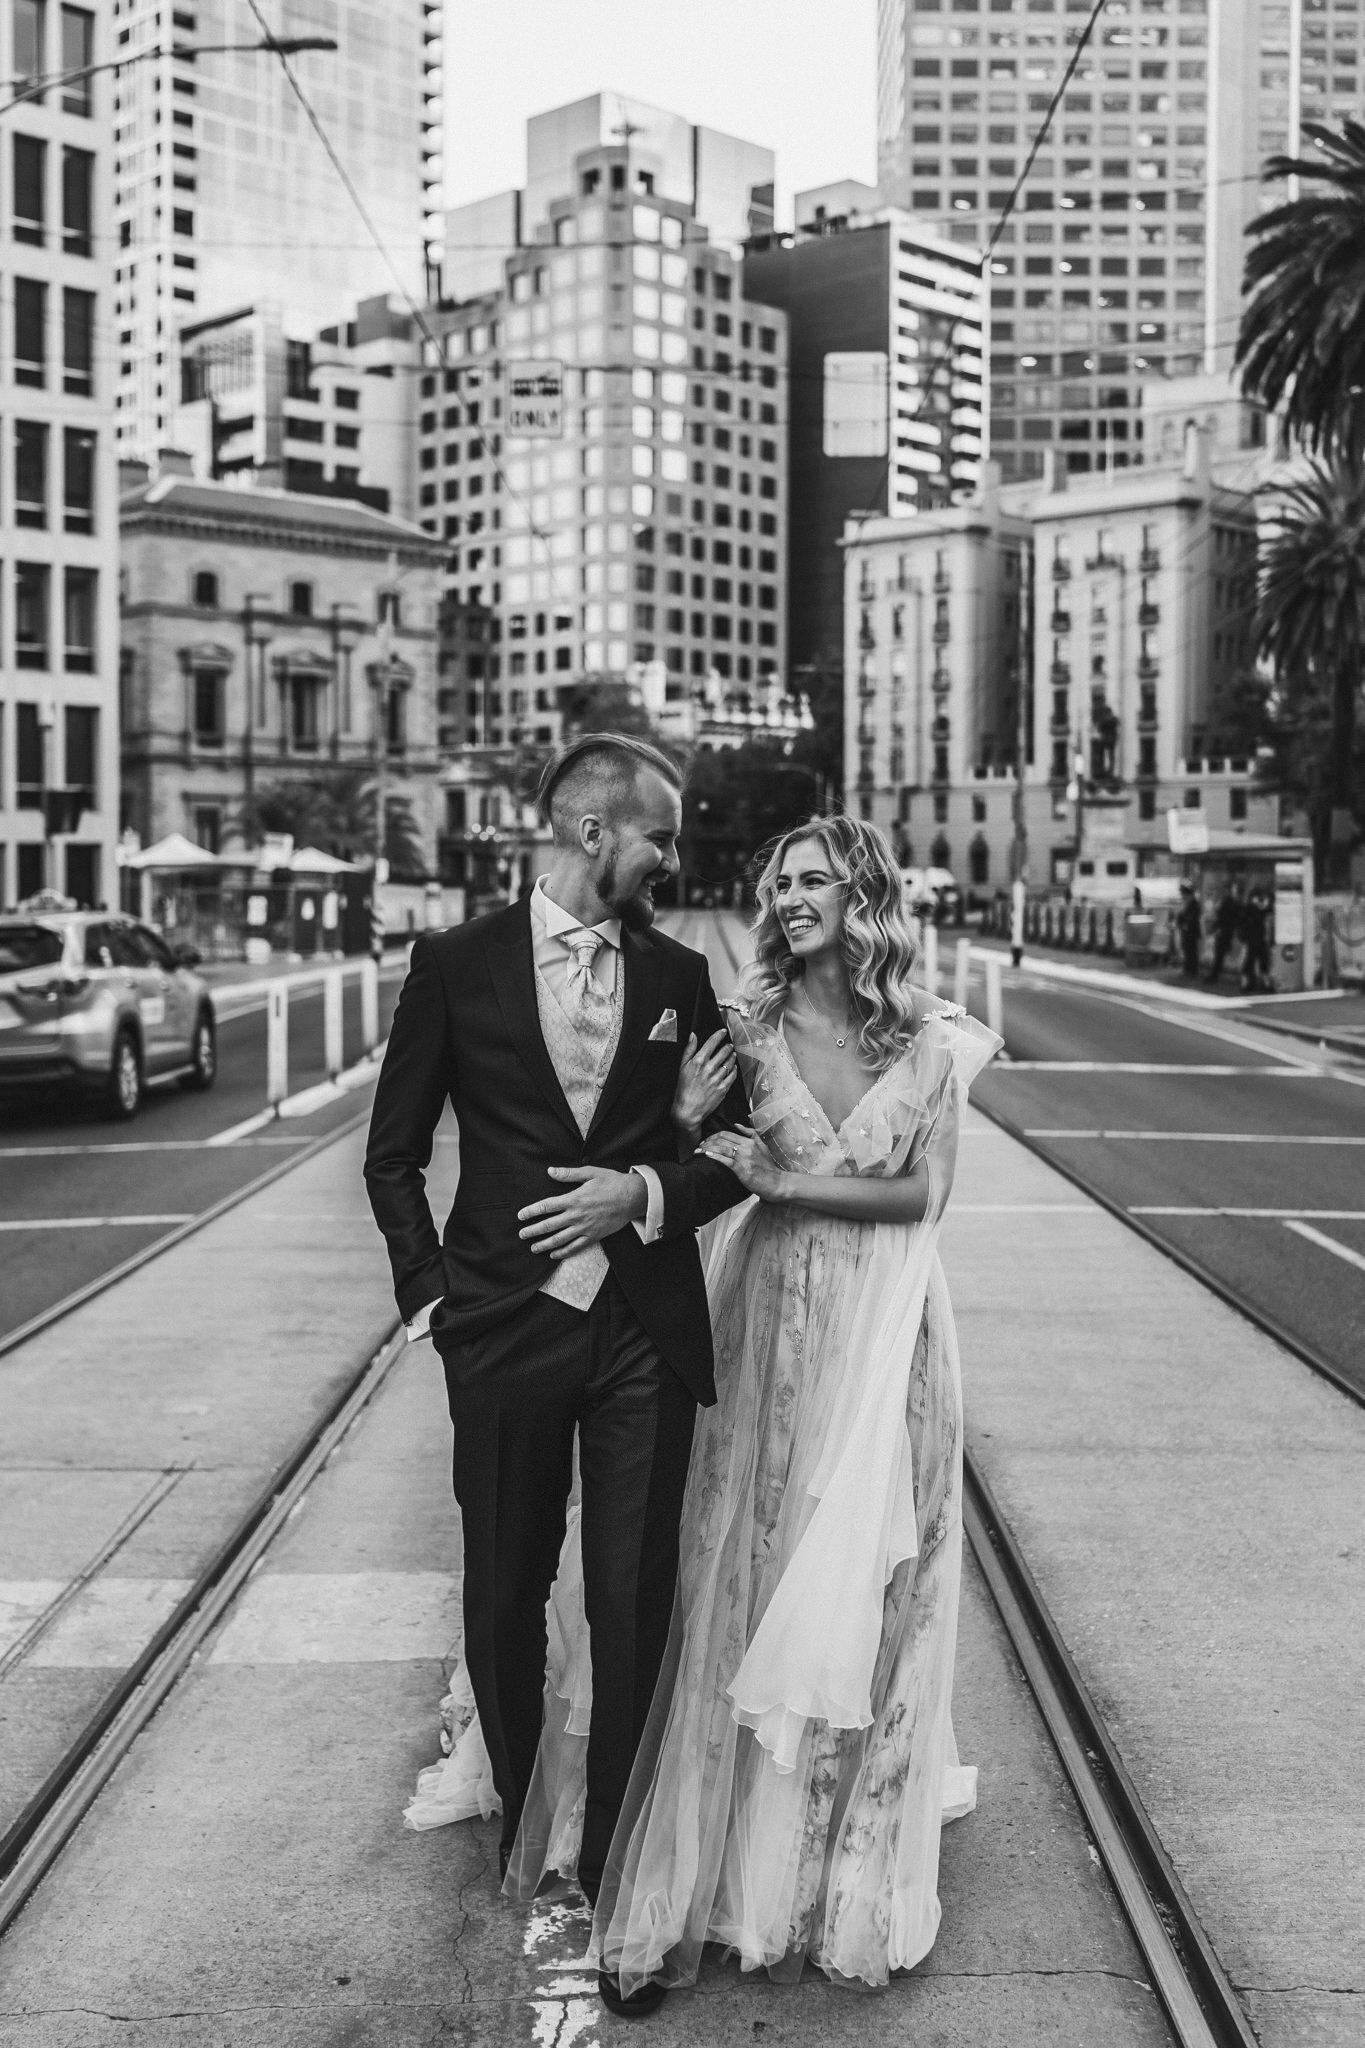 Corey Wright Melbourne Wedding Photography_022.jpg